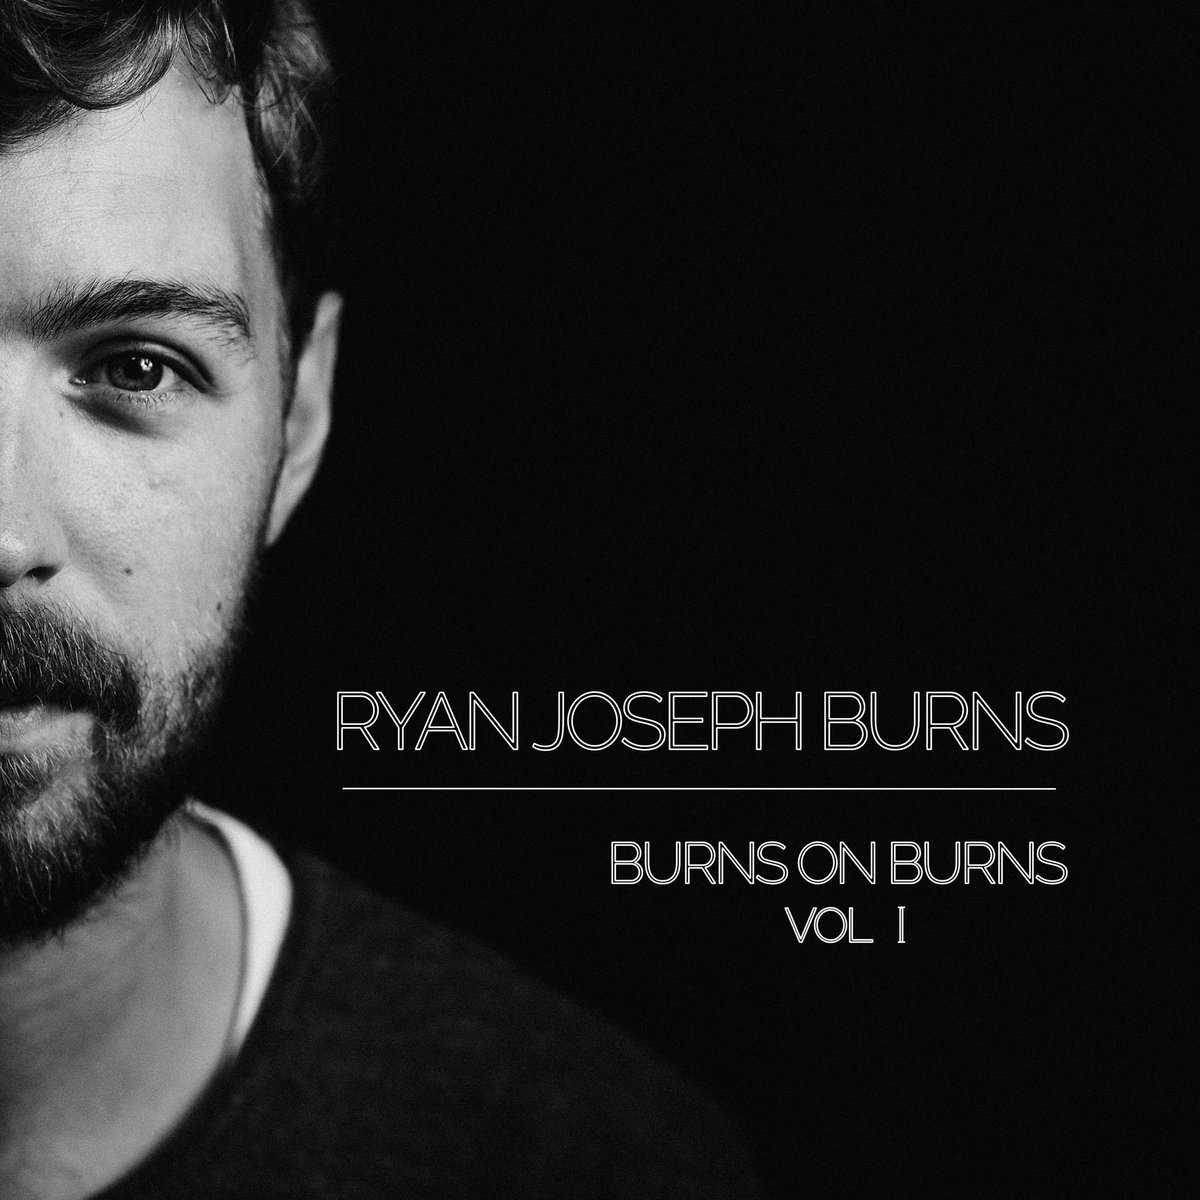 Ryan's treatment of 'Ae Fond Kiss' is simply breathtaking.....fantastic stuff @weelynny @BBCJFShow @JaniceForsyth